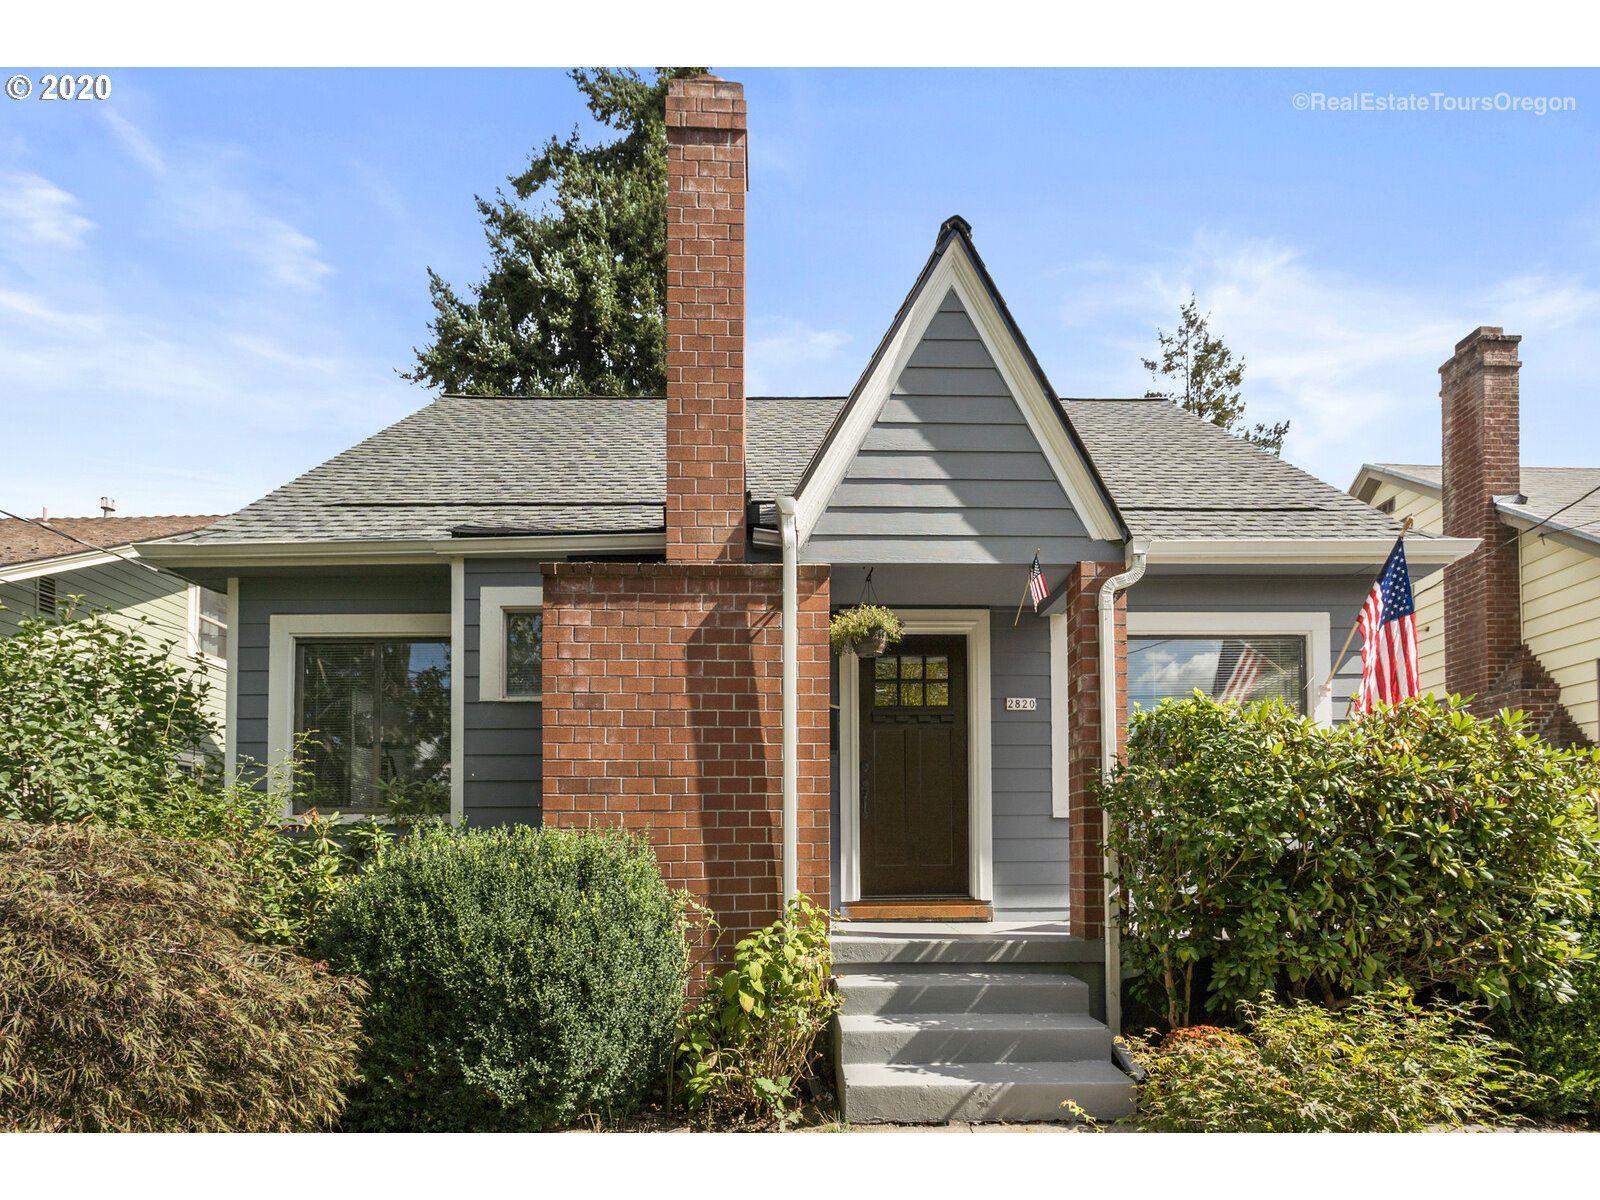 2820 NE 35TH AVE, Portland, OR 97212 - MLS#: 20412317